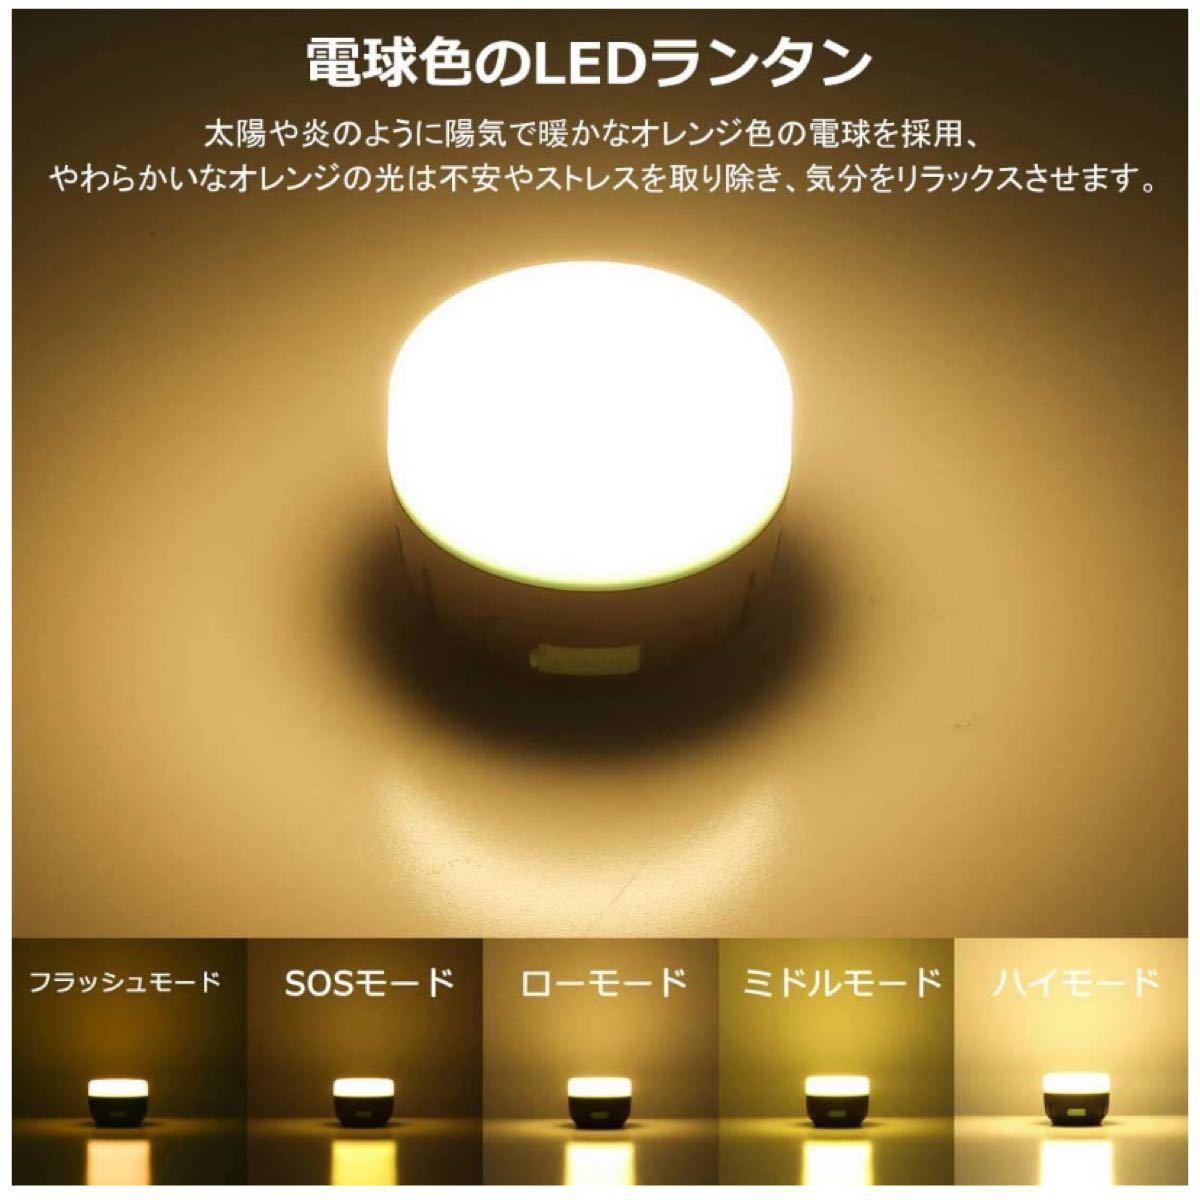 LEDランタン 暖色 電球色 USB充電式 5つ調光モード マグネット式